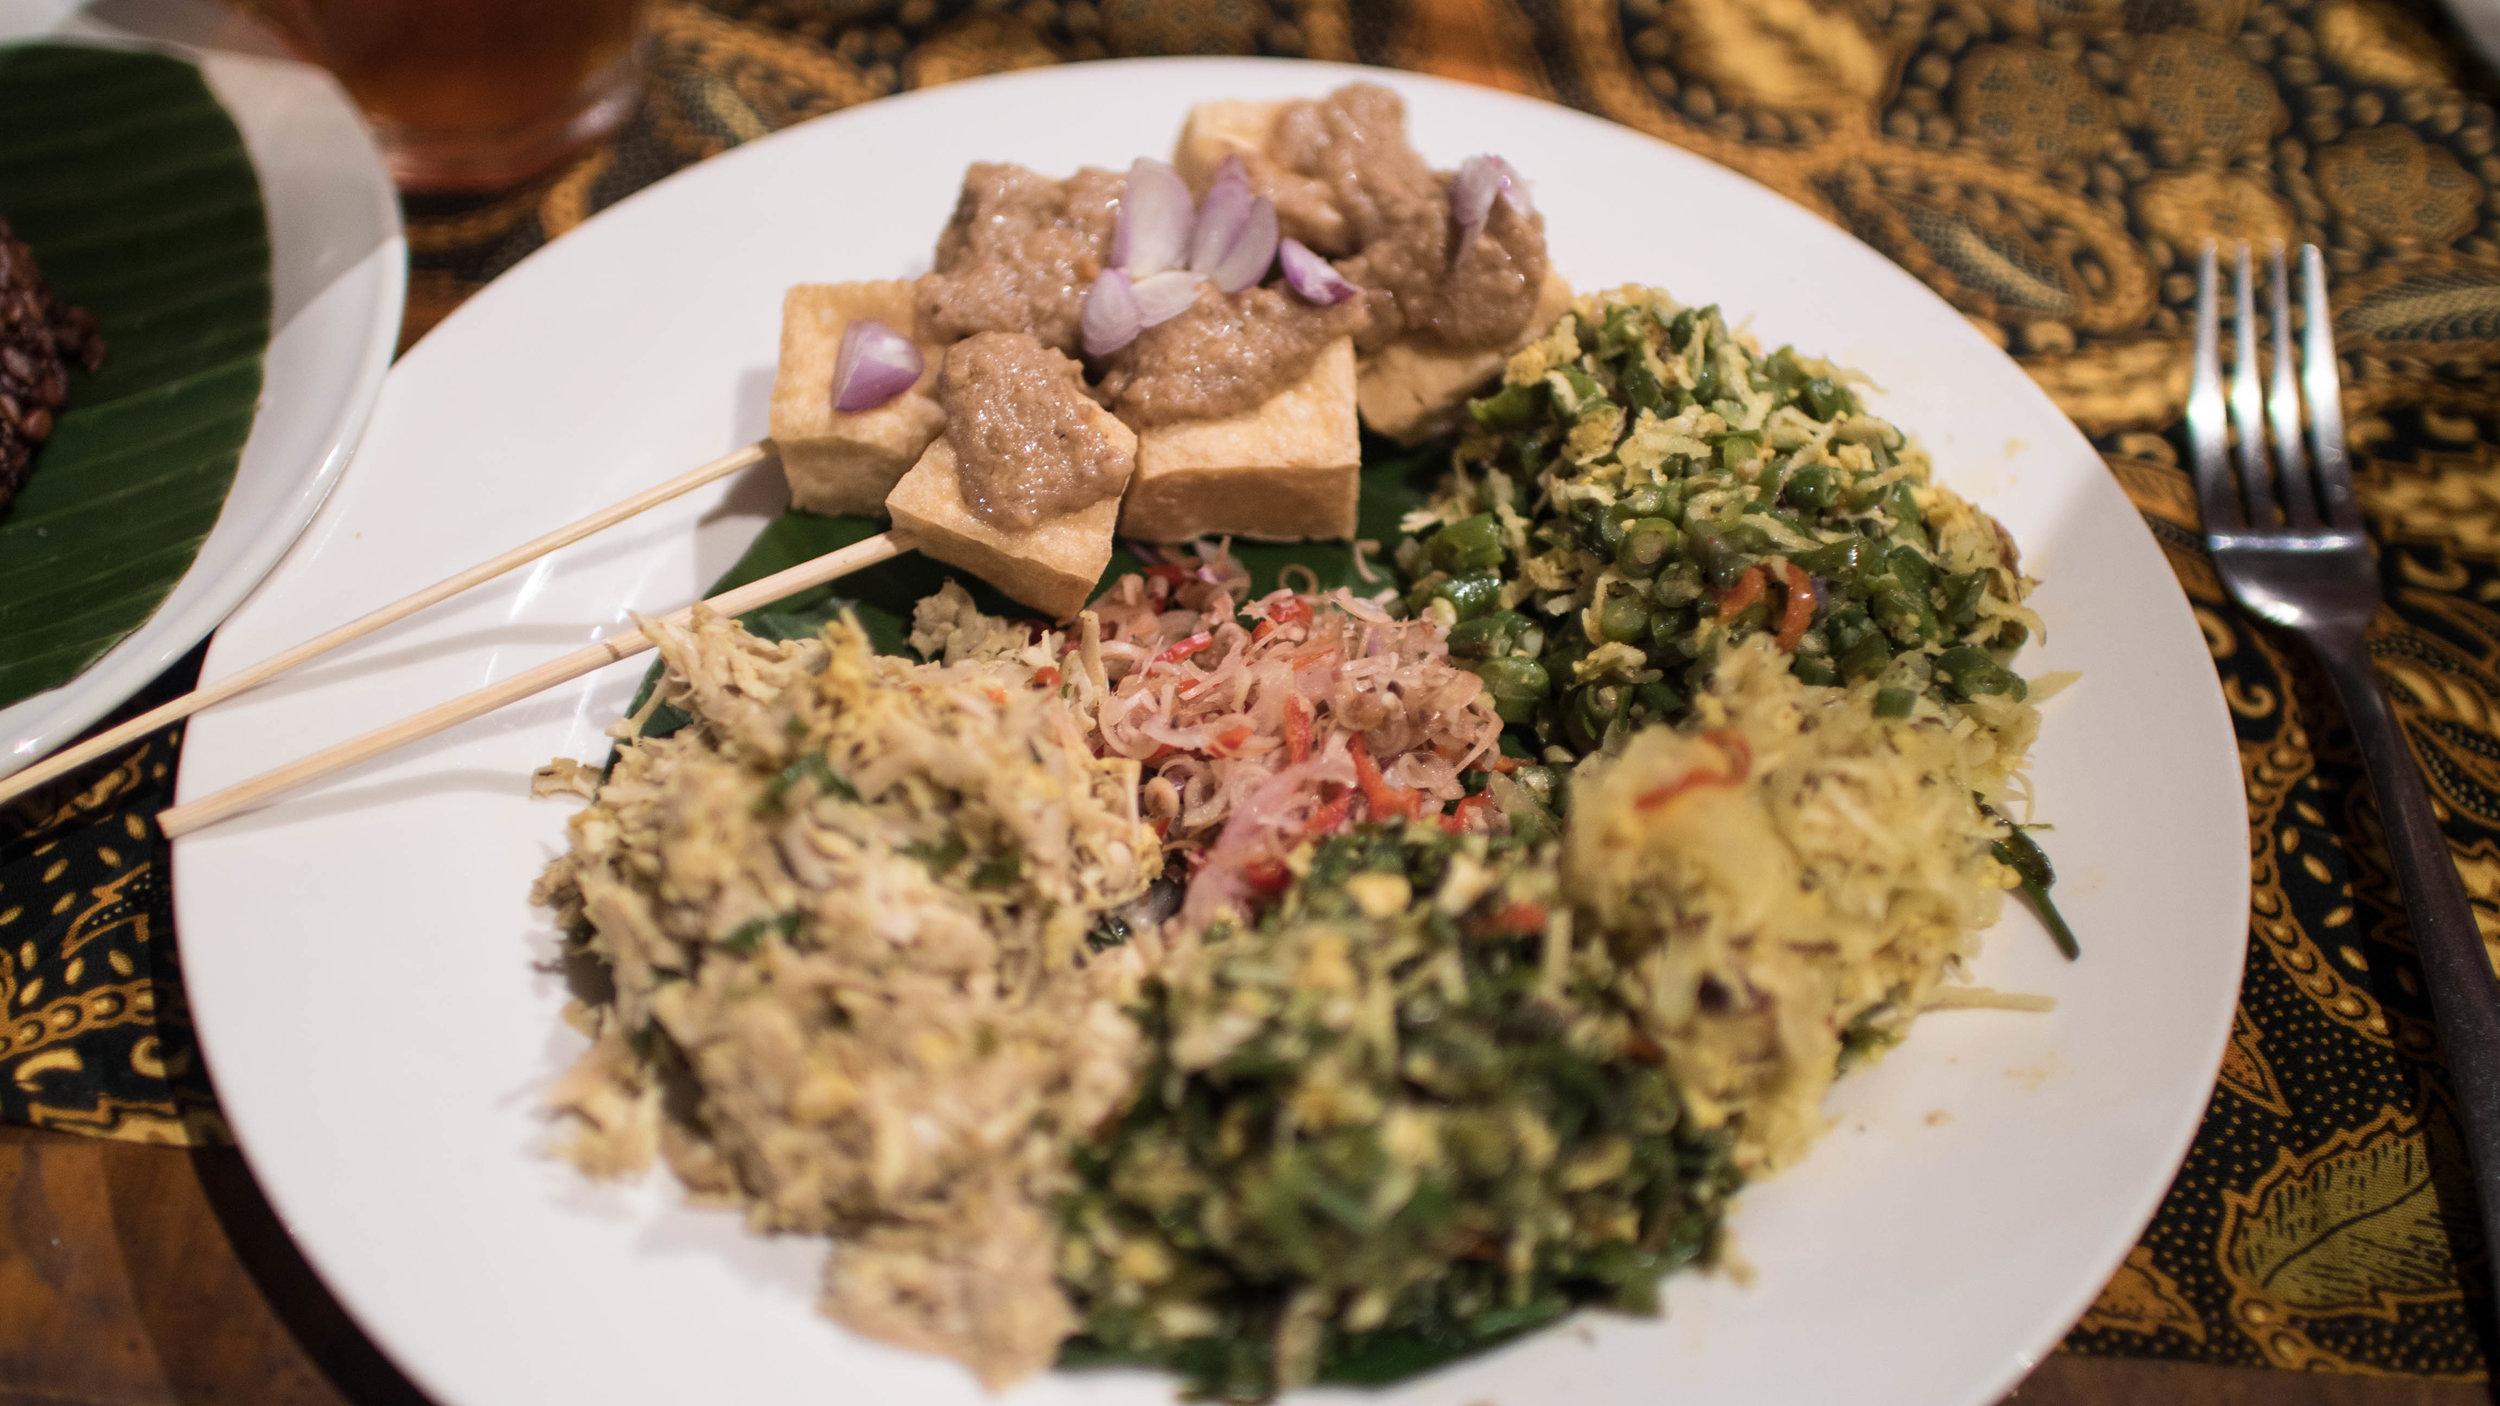 Bali Indo surf vegan food  (7 of 11).jpg